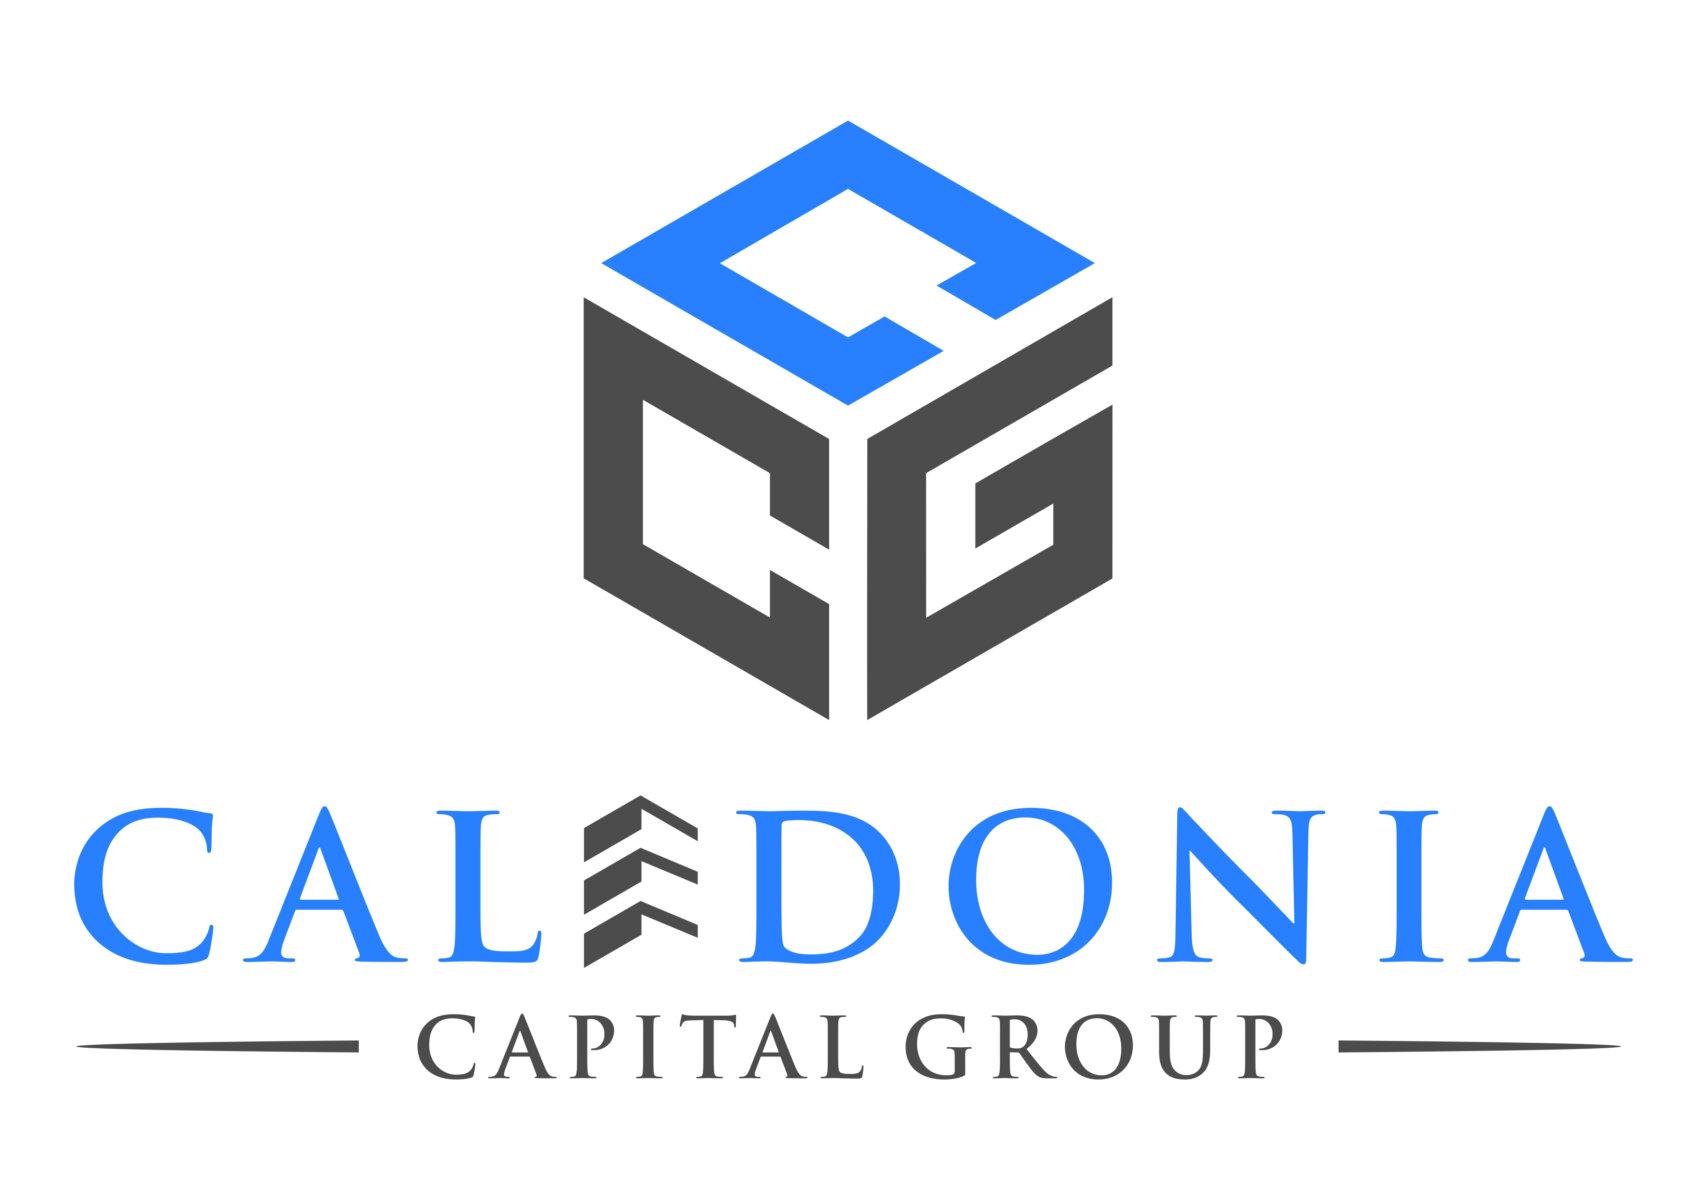 Caledonia Capital Group logo